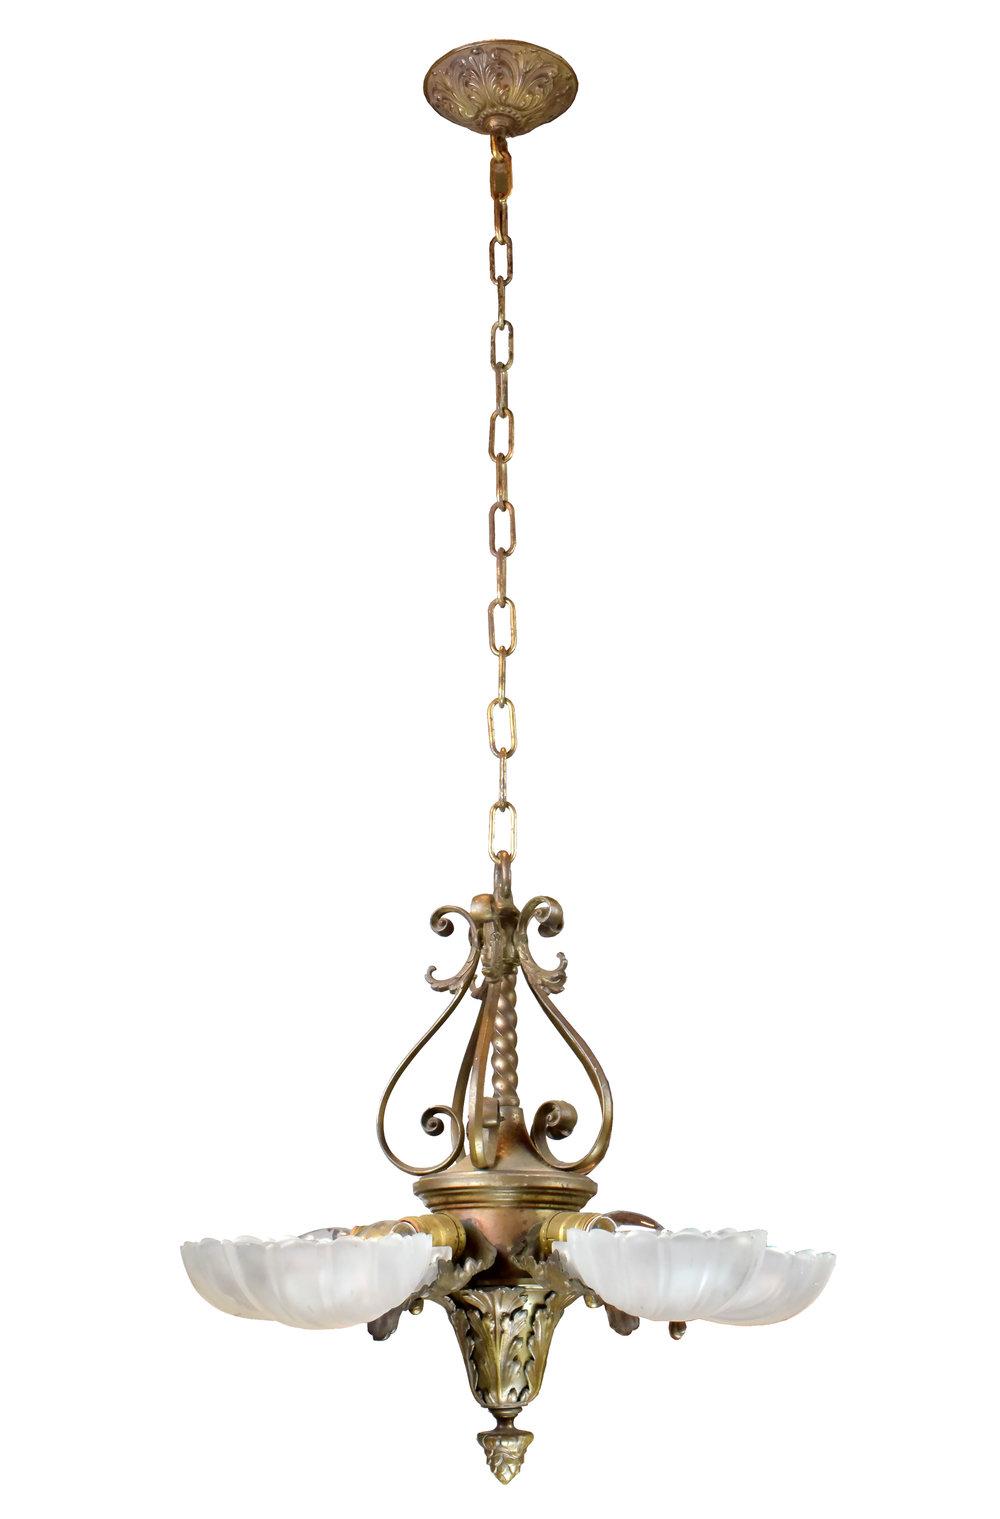 47234-art-deco-five-shade-chandelier-full-view.jpg